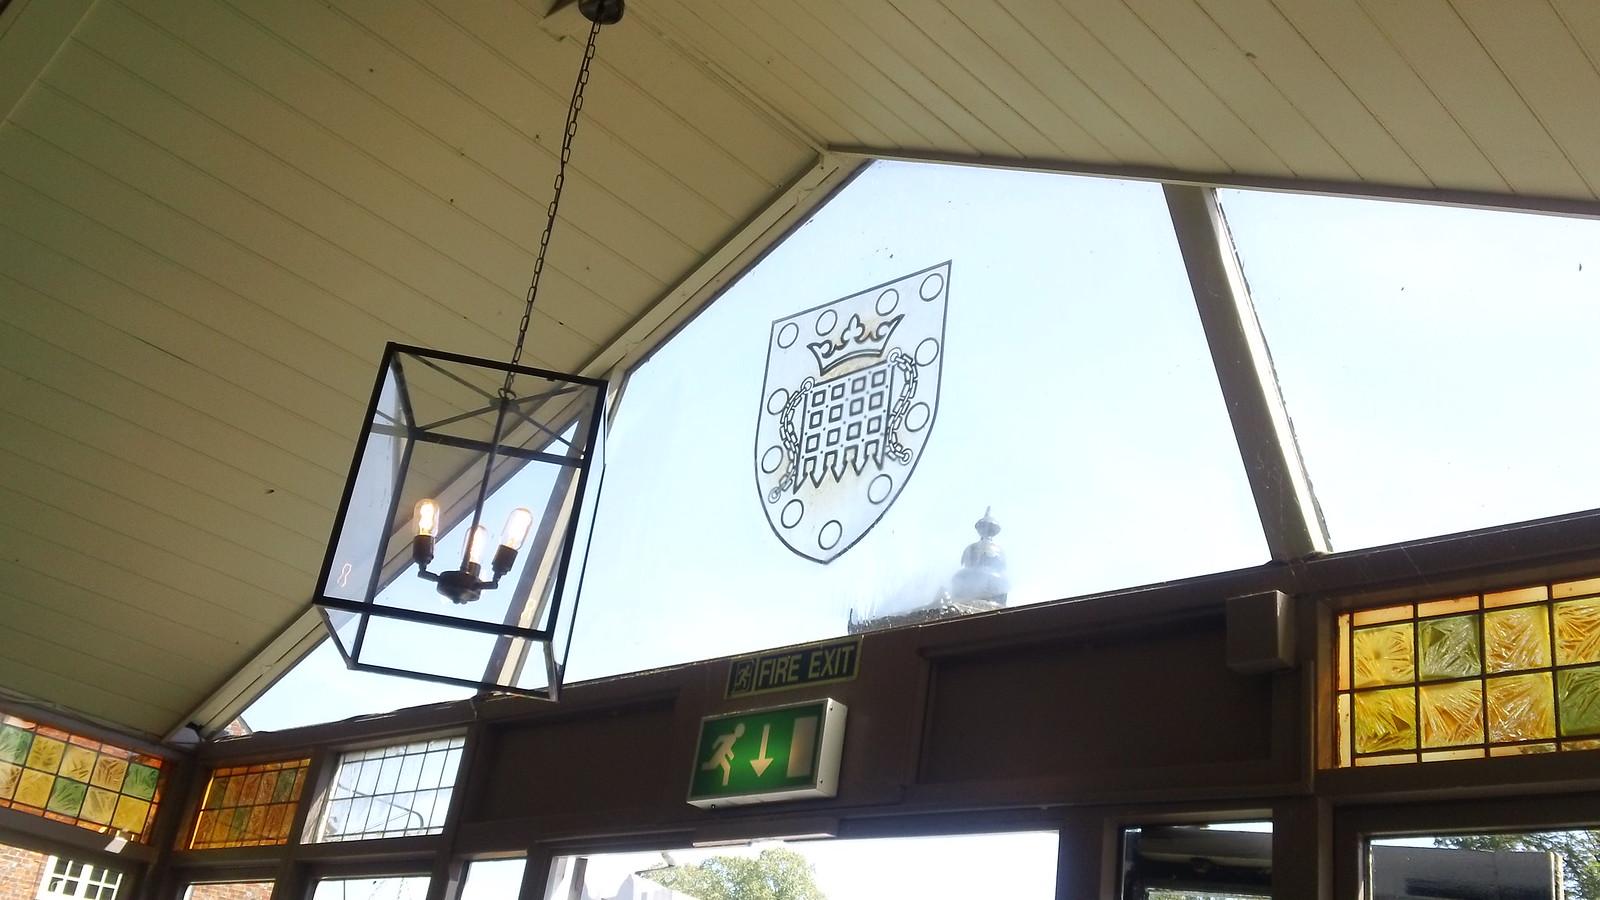 Boat House inn ceiling & window Wallingford, Oxon